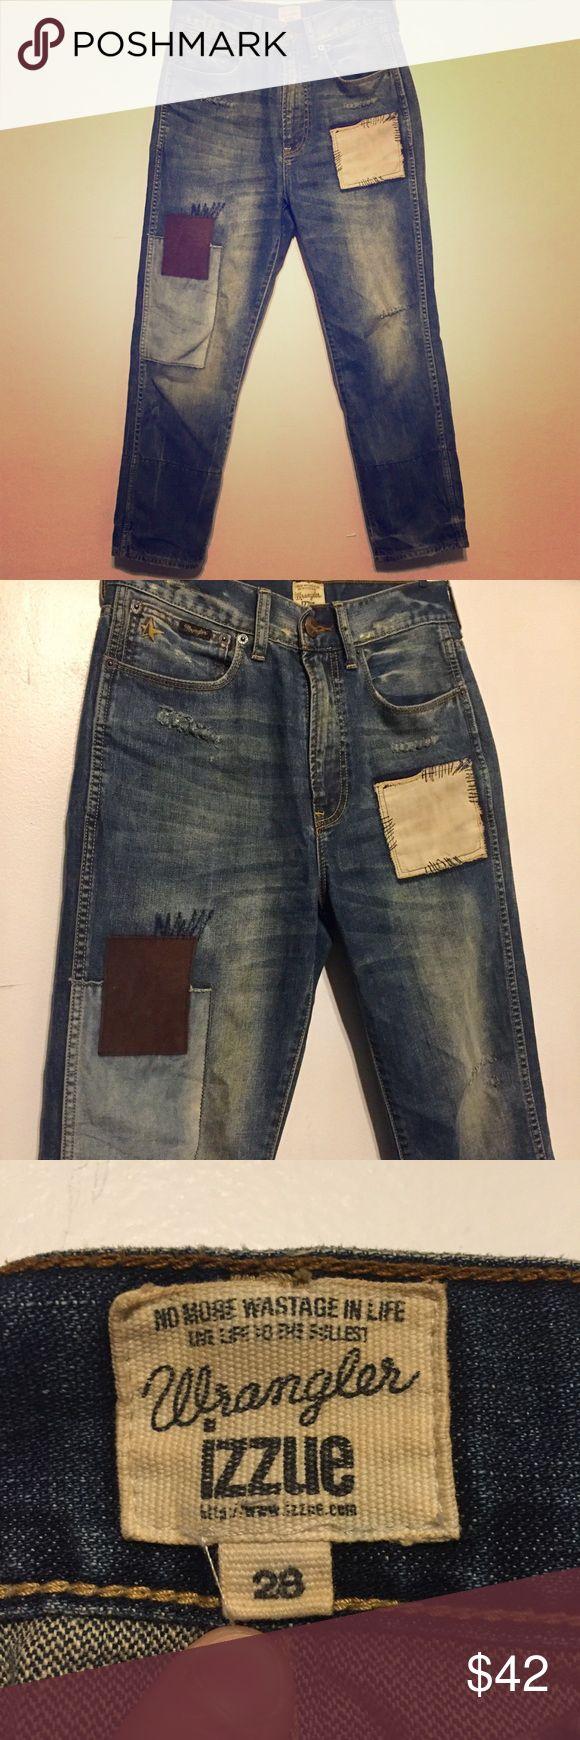 Wrangler / Izzue Collaborative Jeans RARE Ltd Ed. Super rare high rise Wrangler / Izzue collab jeans. Patchwork design. Super comfy. High waist. Wrangler Jeans Ankle & Cropped